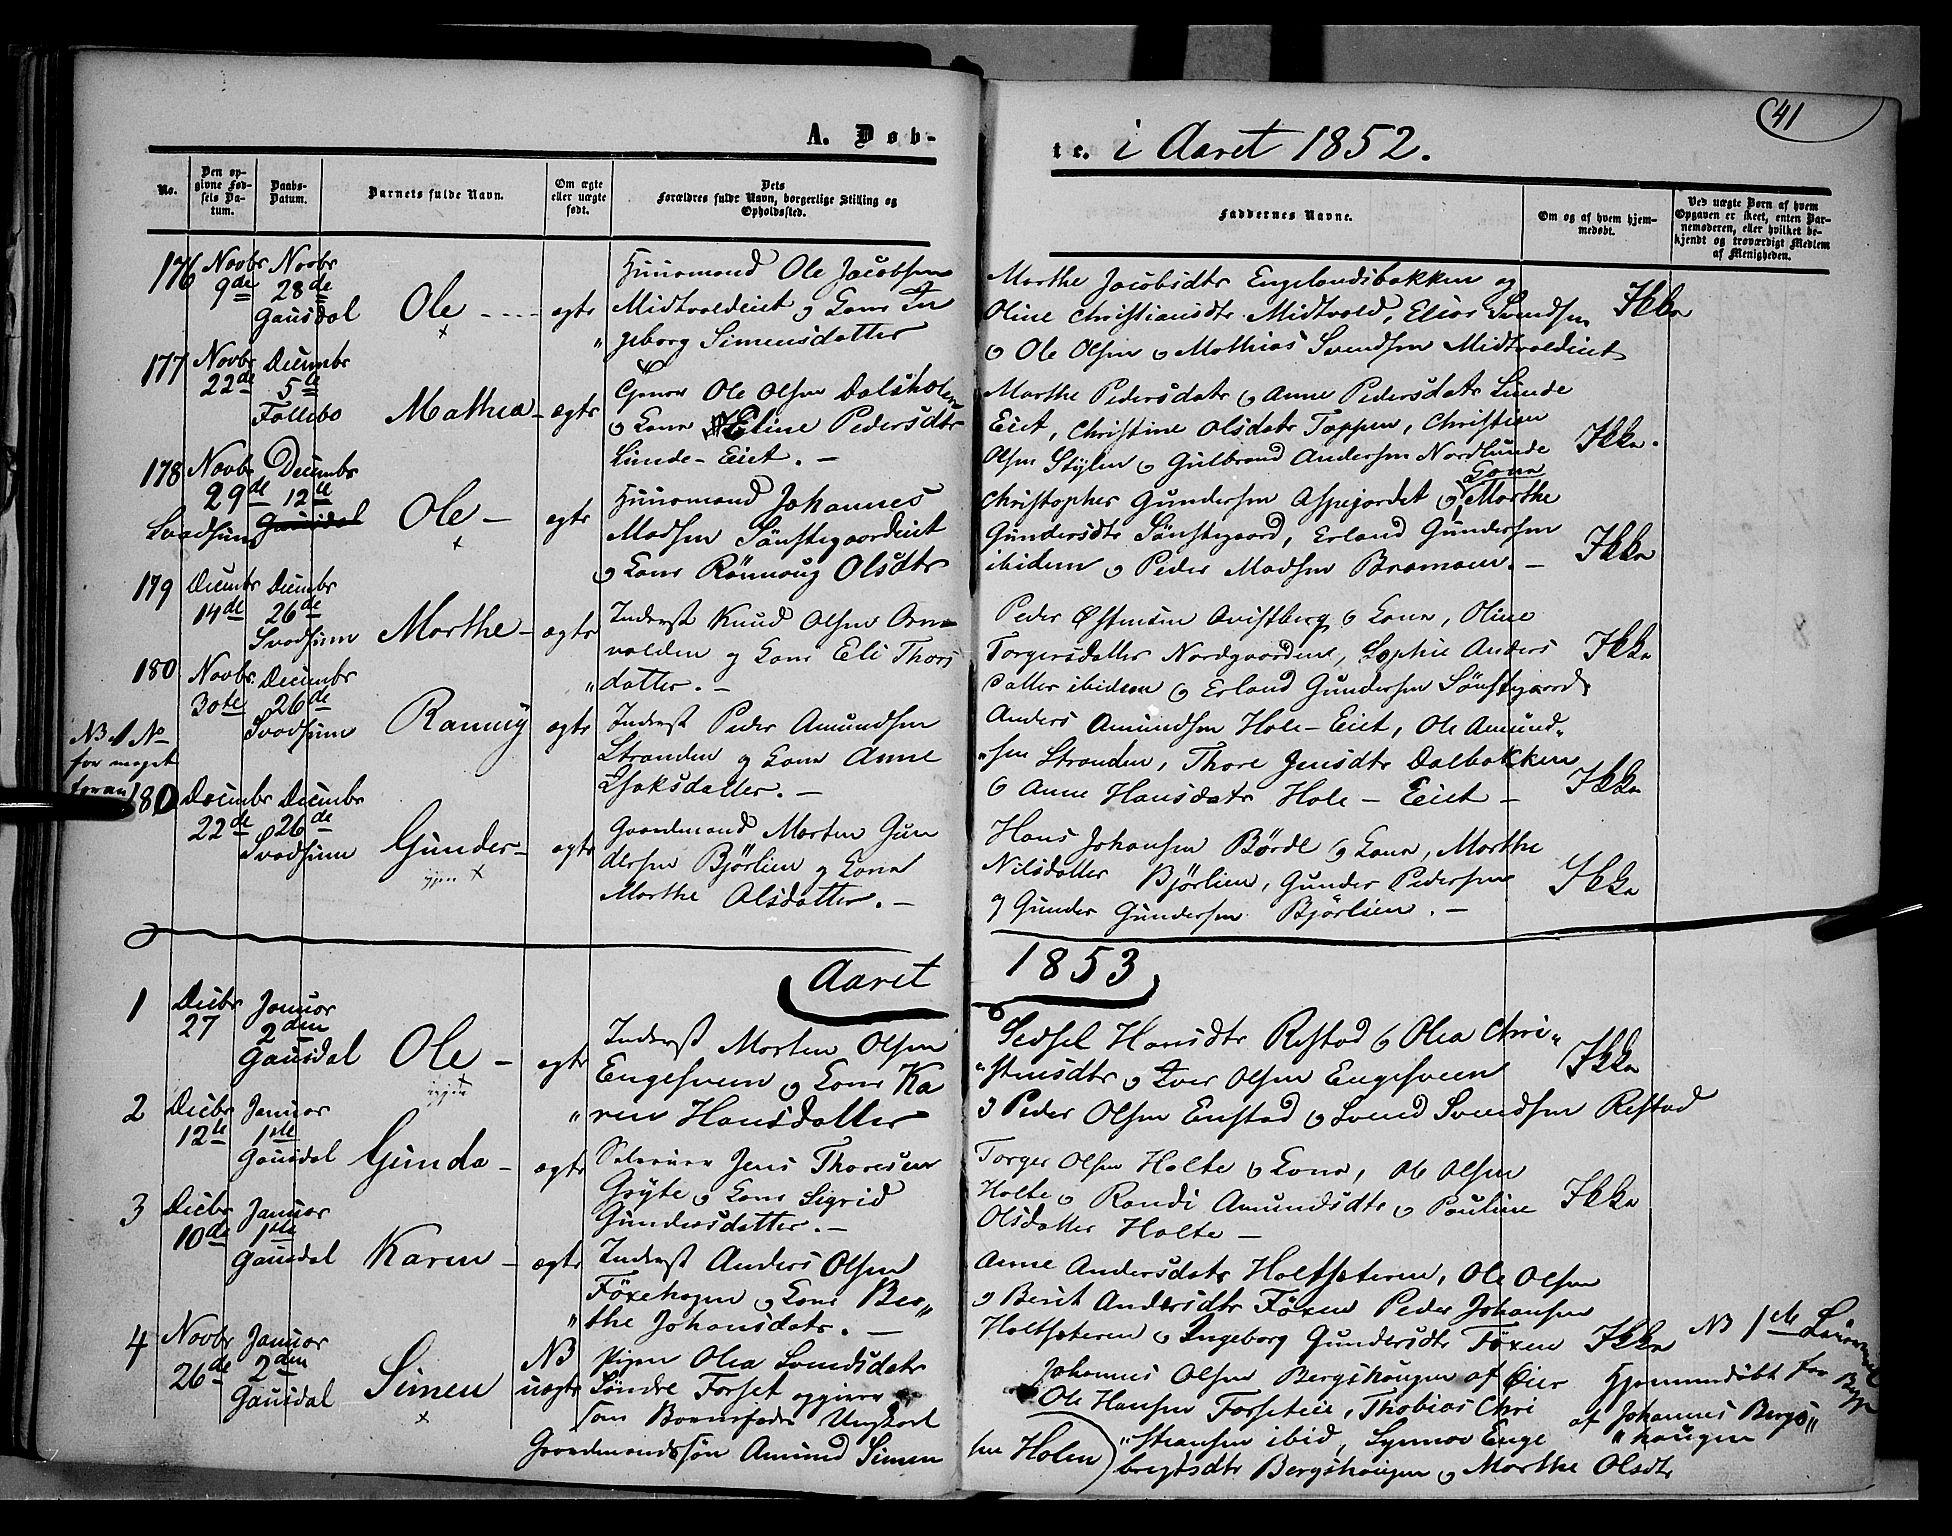 SAH, Gausdal prestekontor, Ministerialbok nr. 8, 1850-1861, s. 41